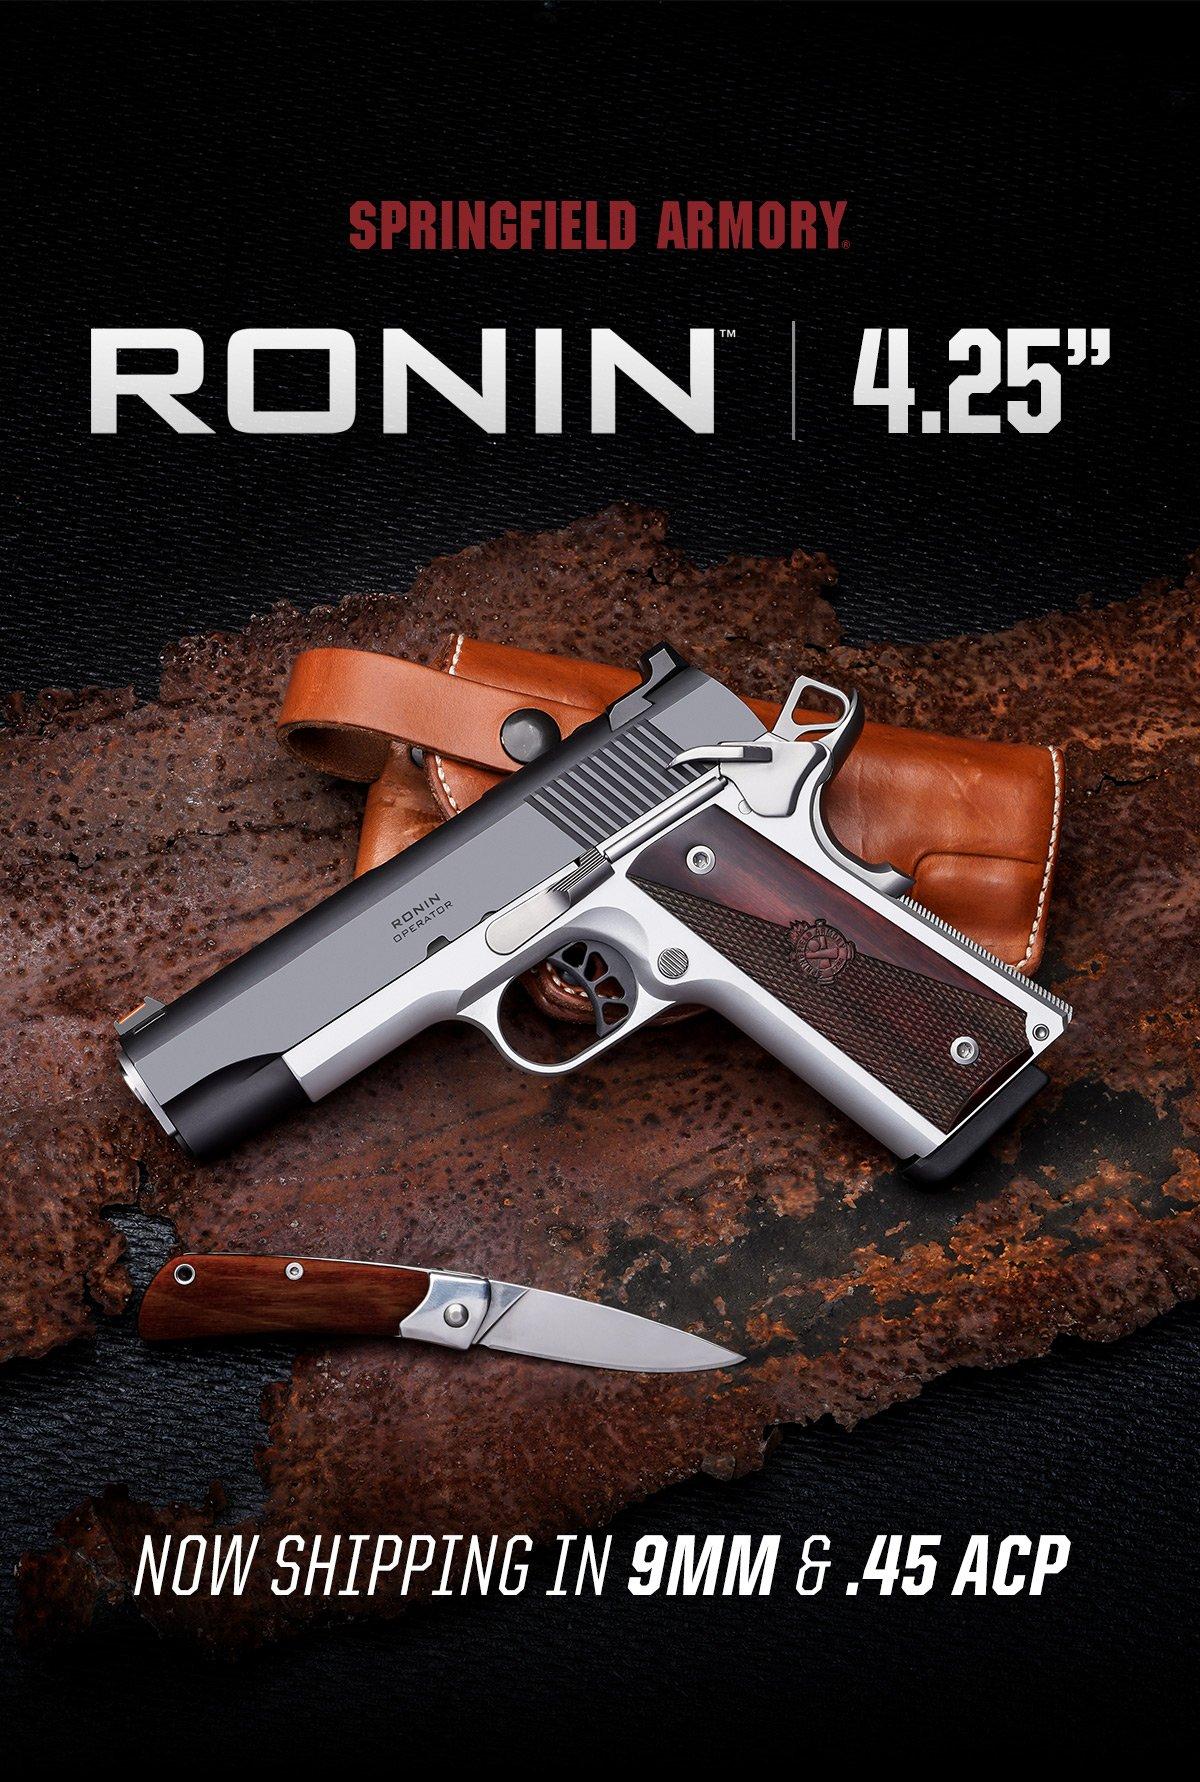 ronin-425-distributor-header-2